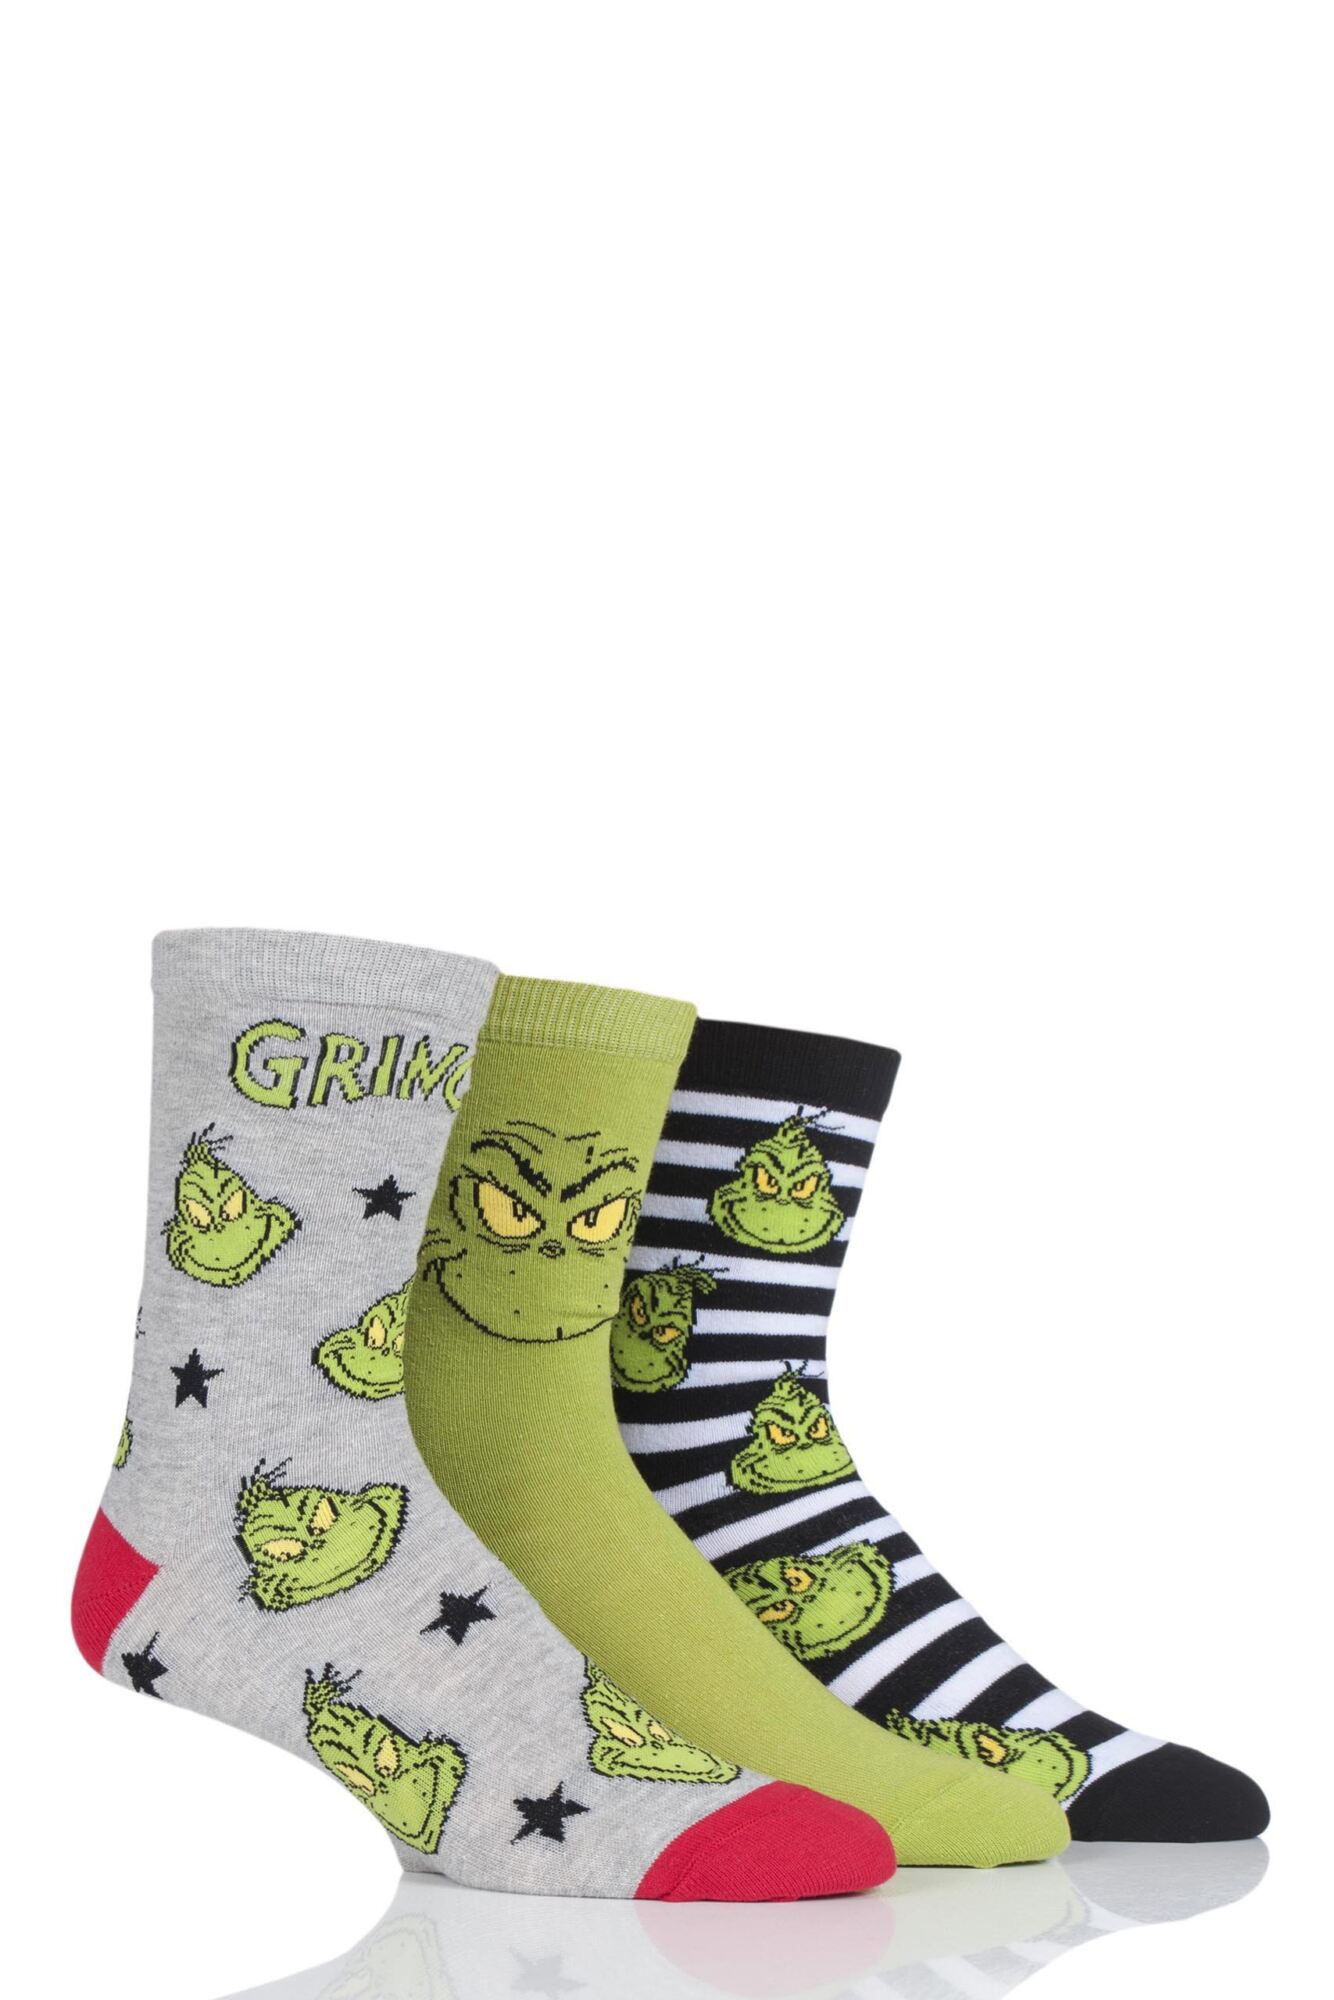 3 Pair Grinch Cotton Socks Unisex - Film & TV Characters